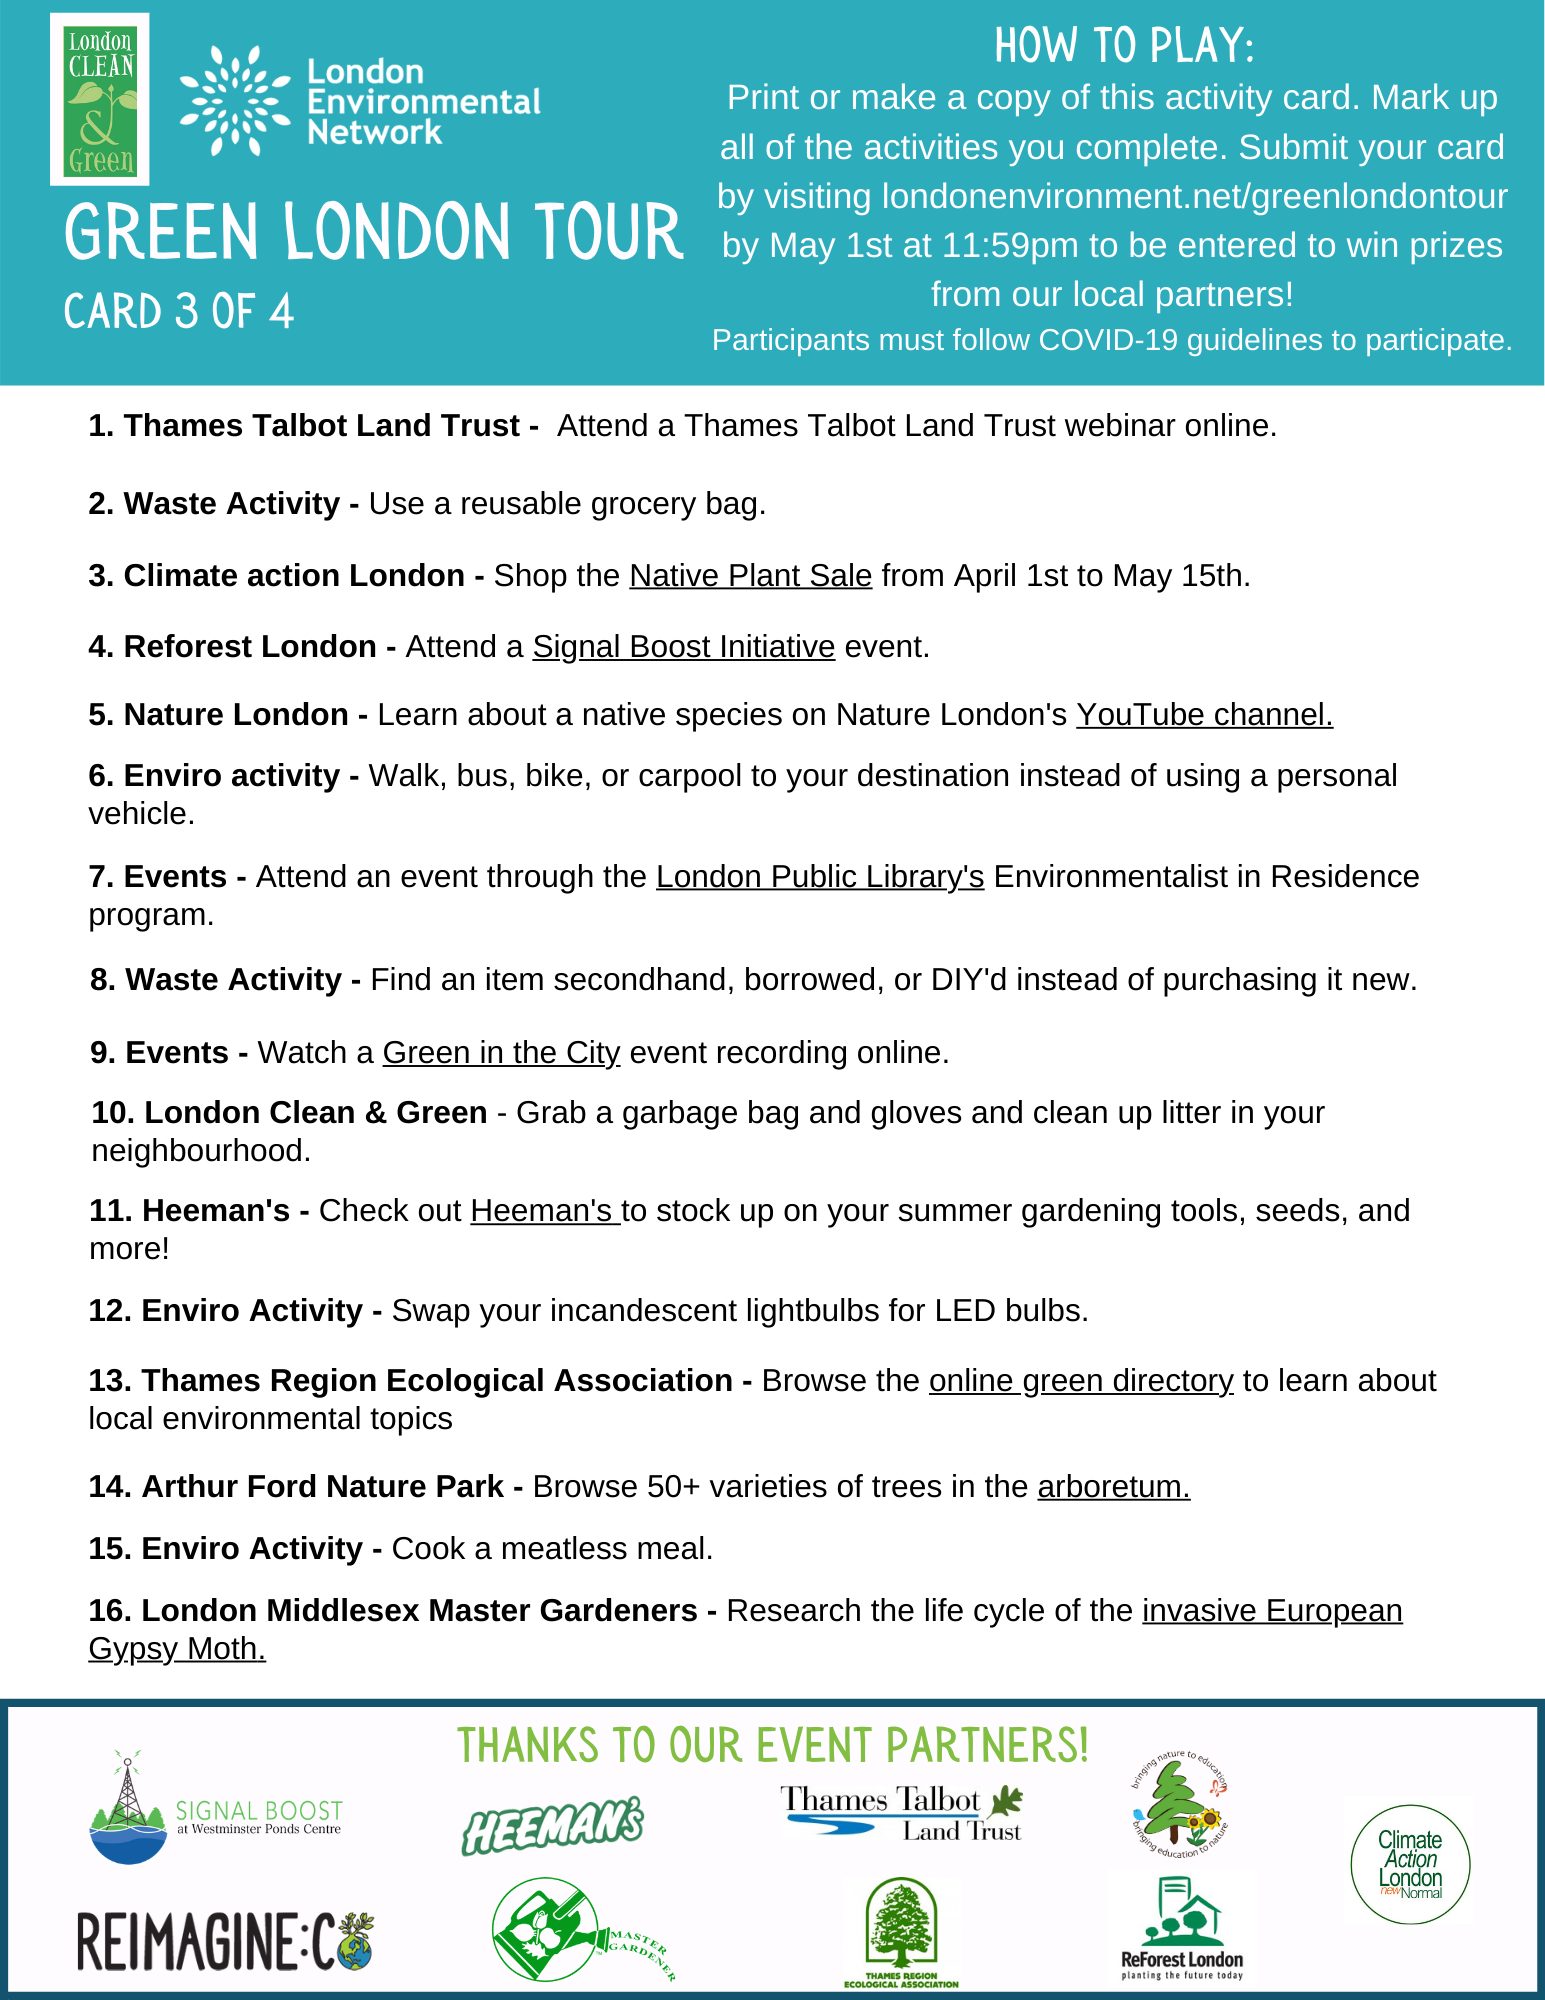 Green London Tour List 3